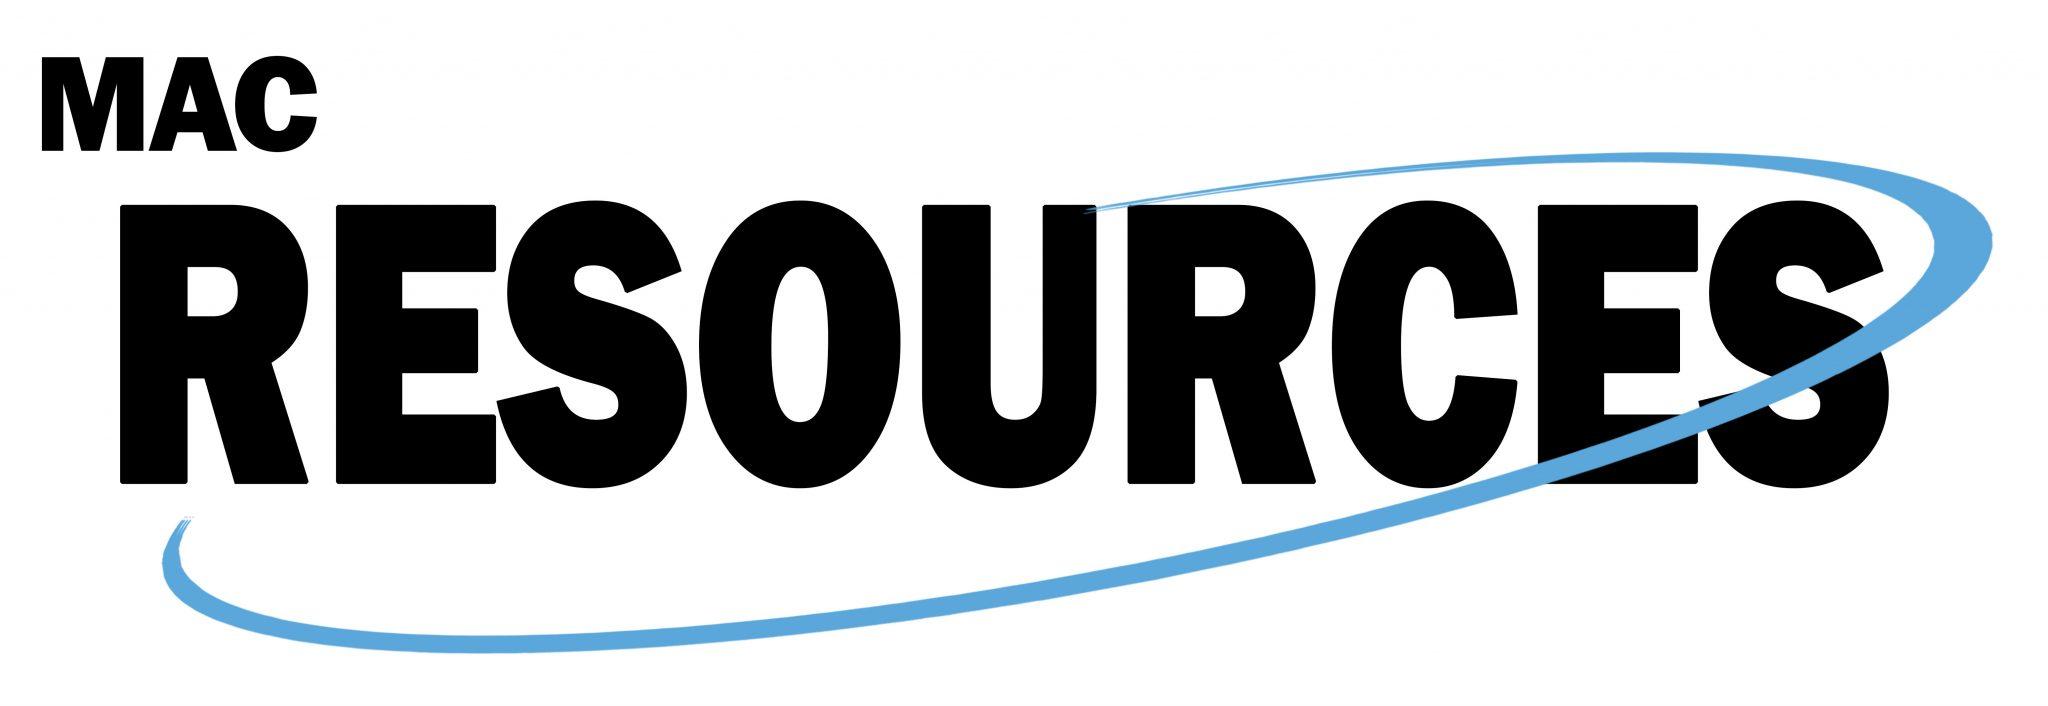 MAC Resources